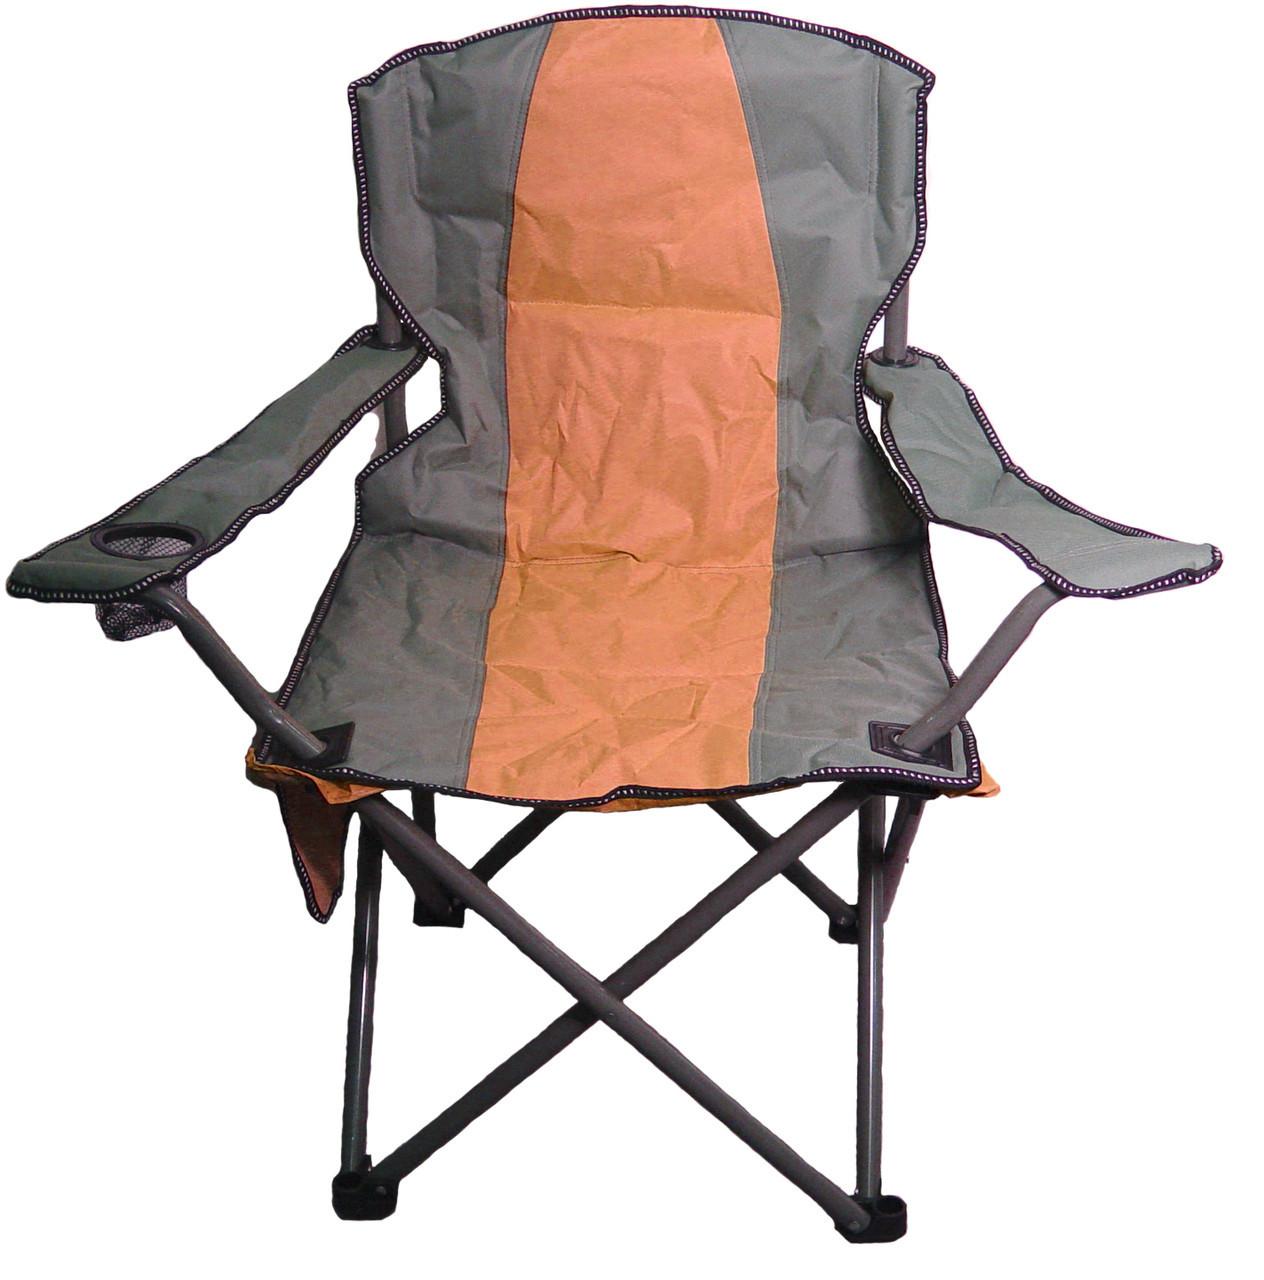 Кресло раскладное Директор Лайт R28842 оранжевое, 90х54х100 см